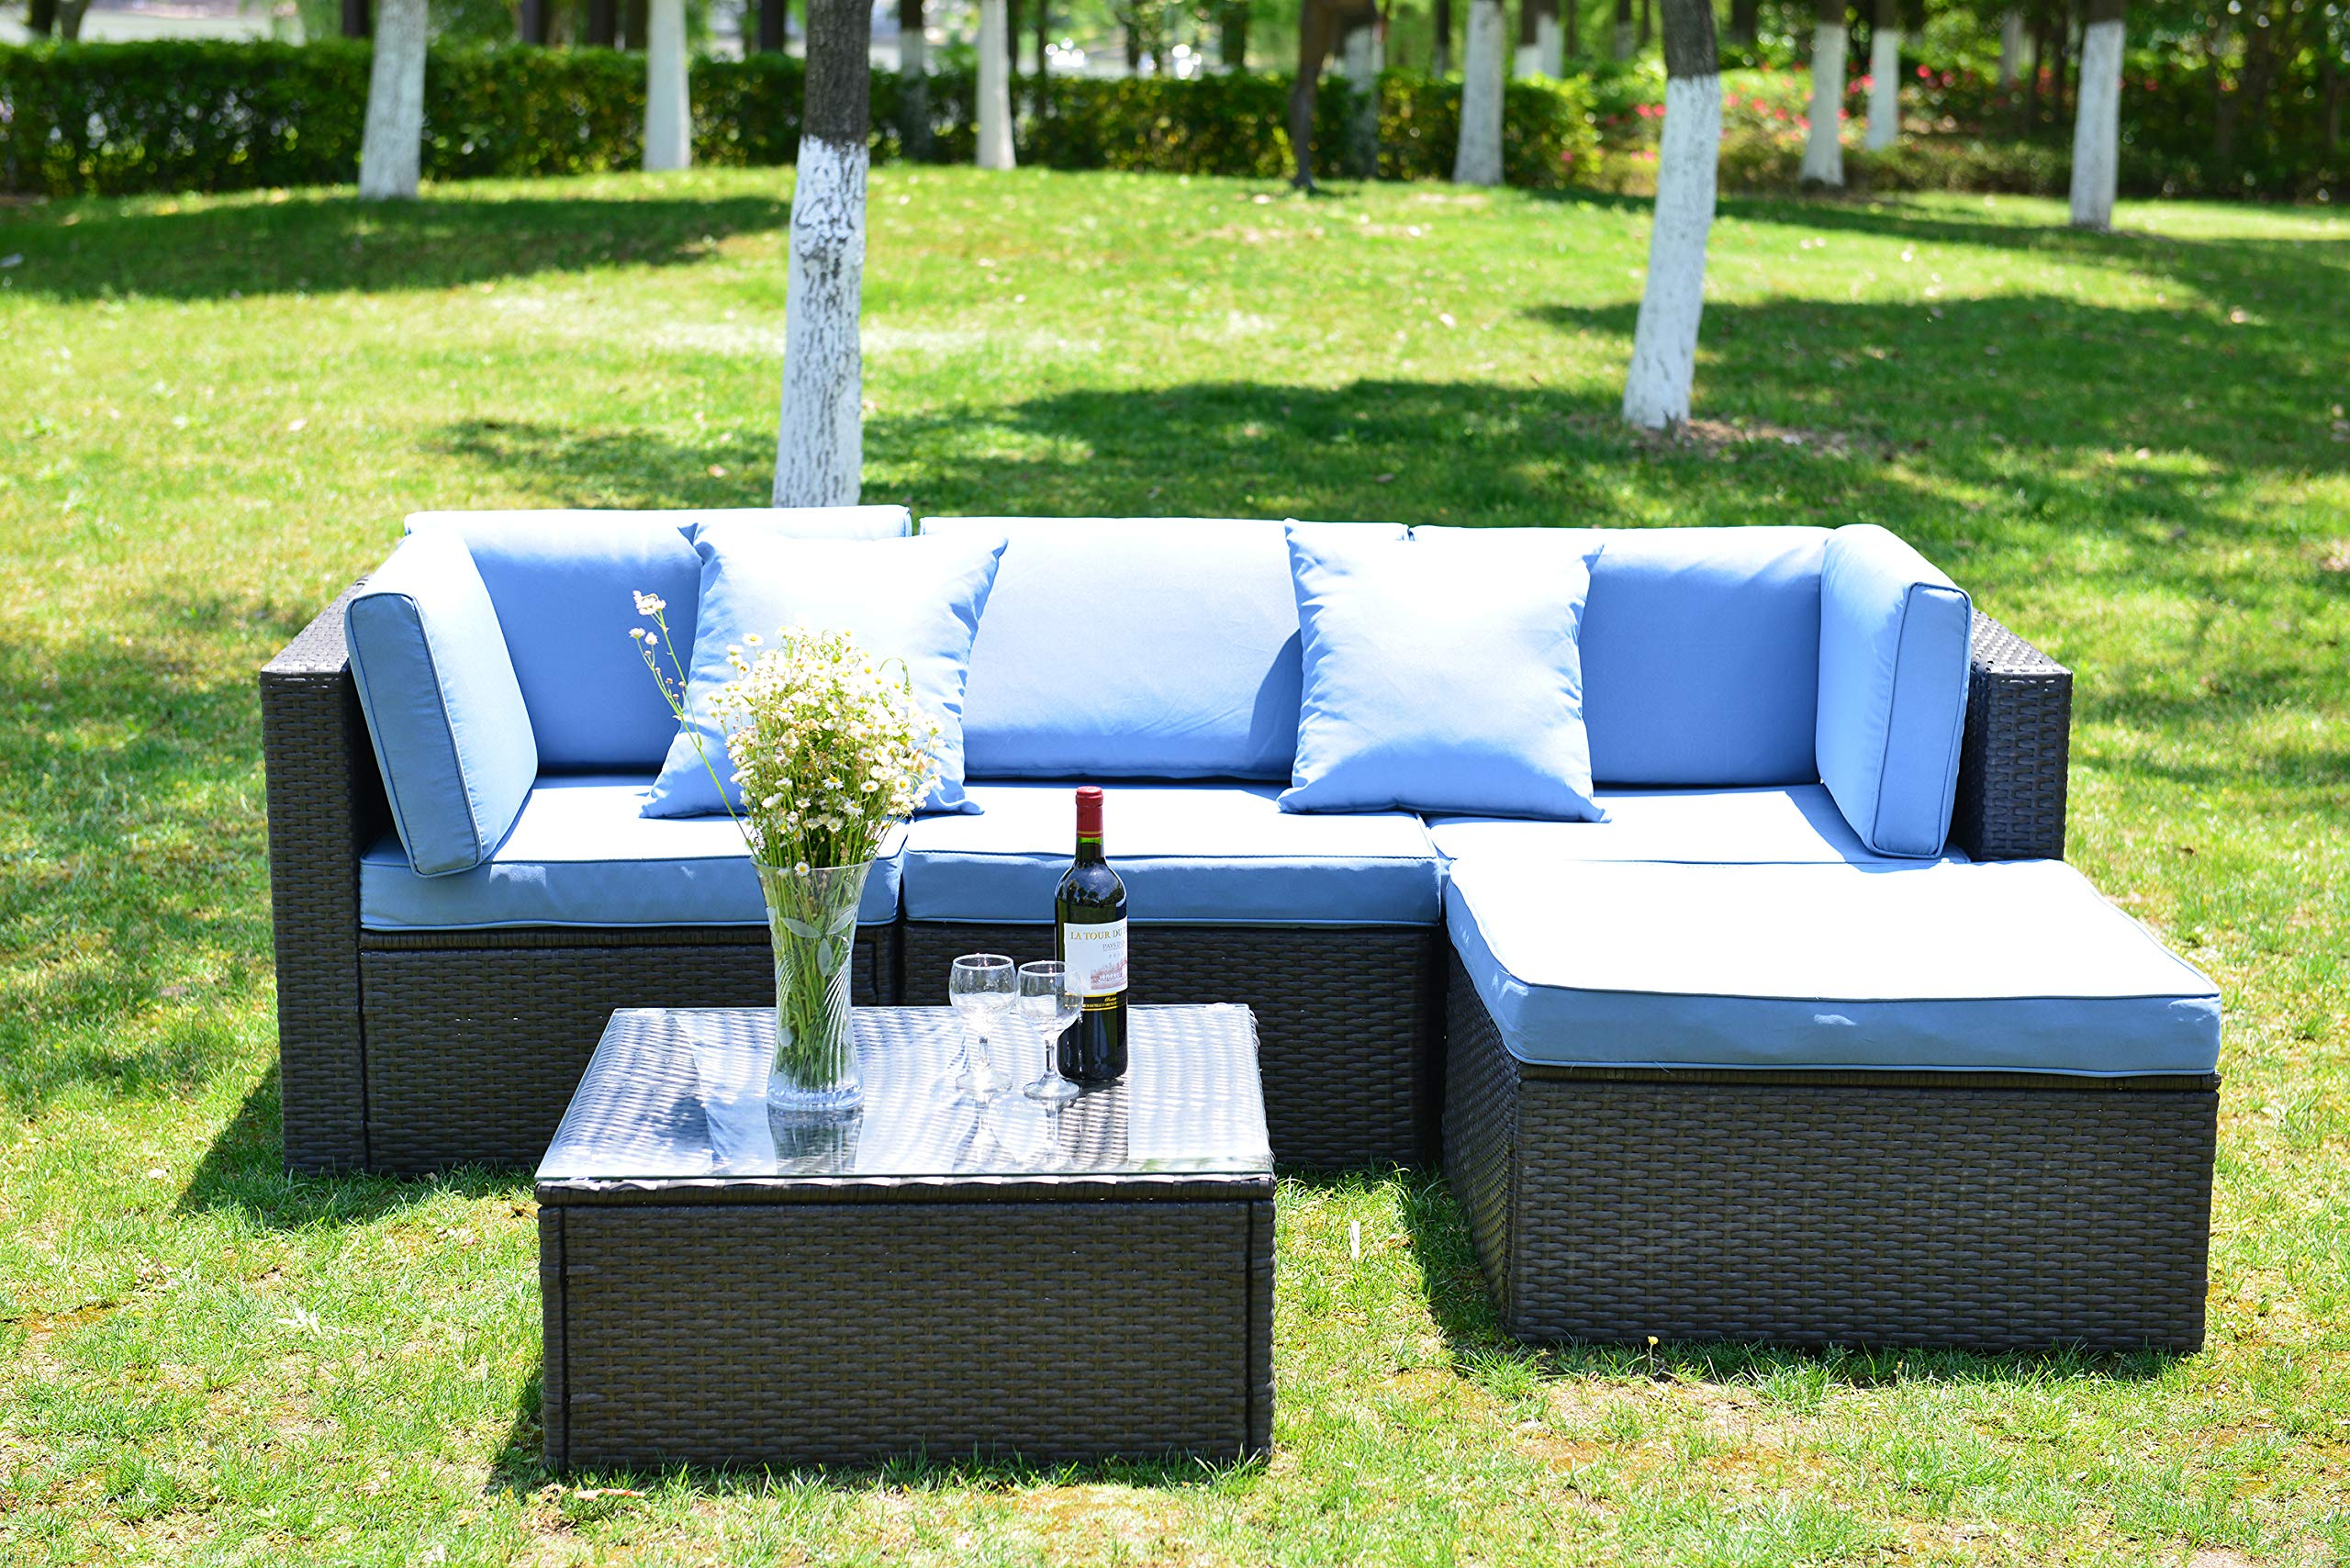 GOJOOASIS Outdoor Patio PE Wicker Rattan Sofa Sectional Furniture Conversation Set with Cushion and Pillow, Steel Frame, Black (5pcs Rattan Sofa Set)